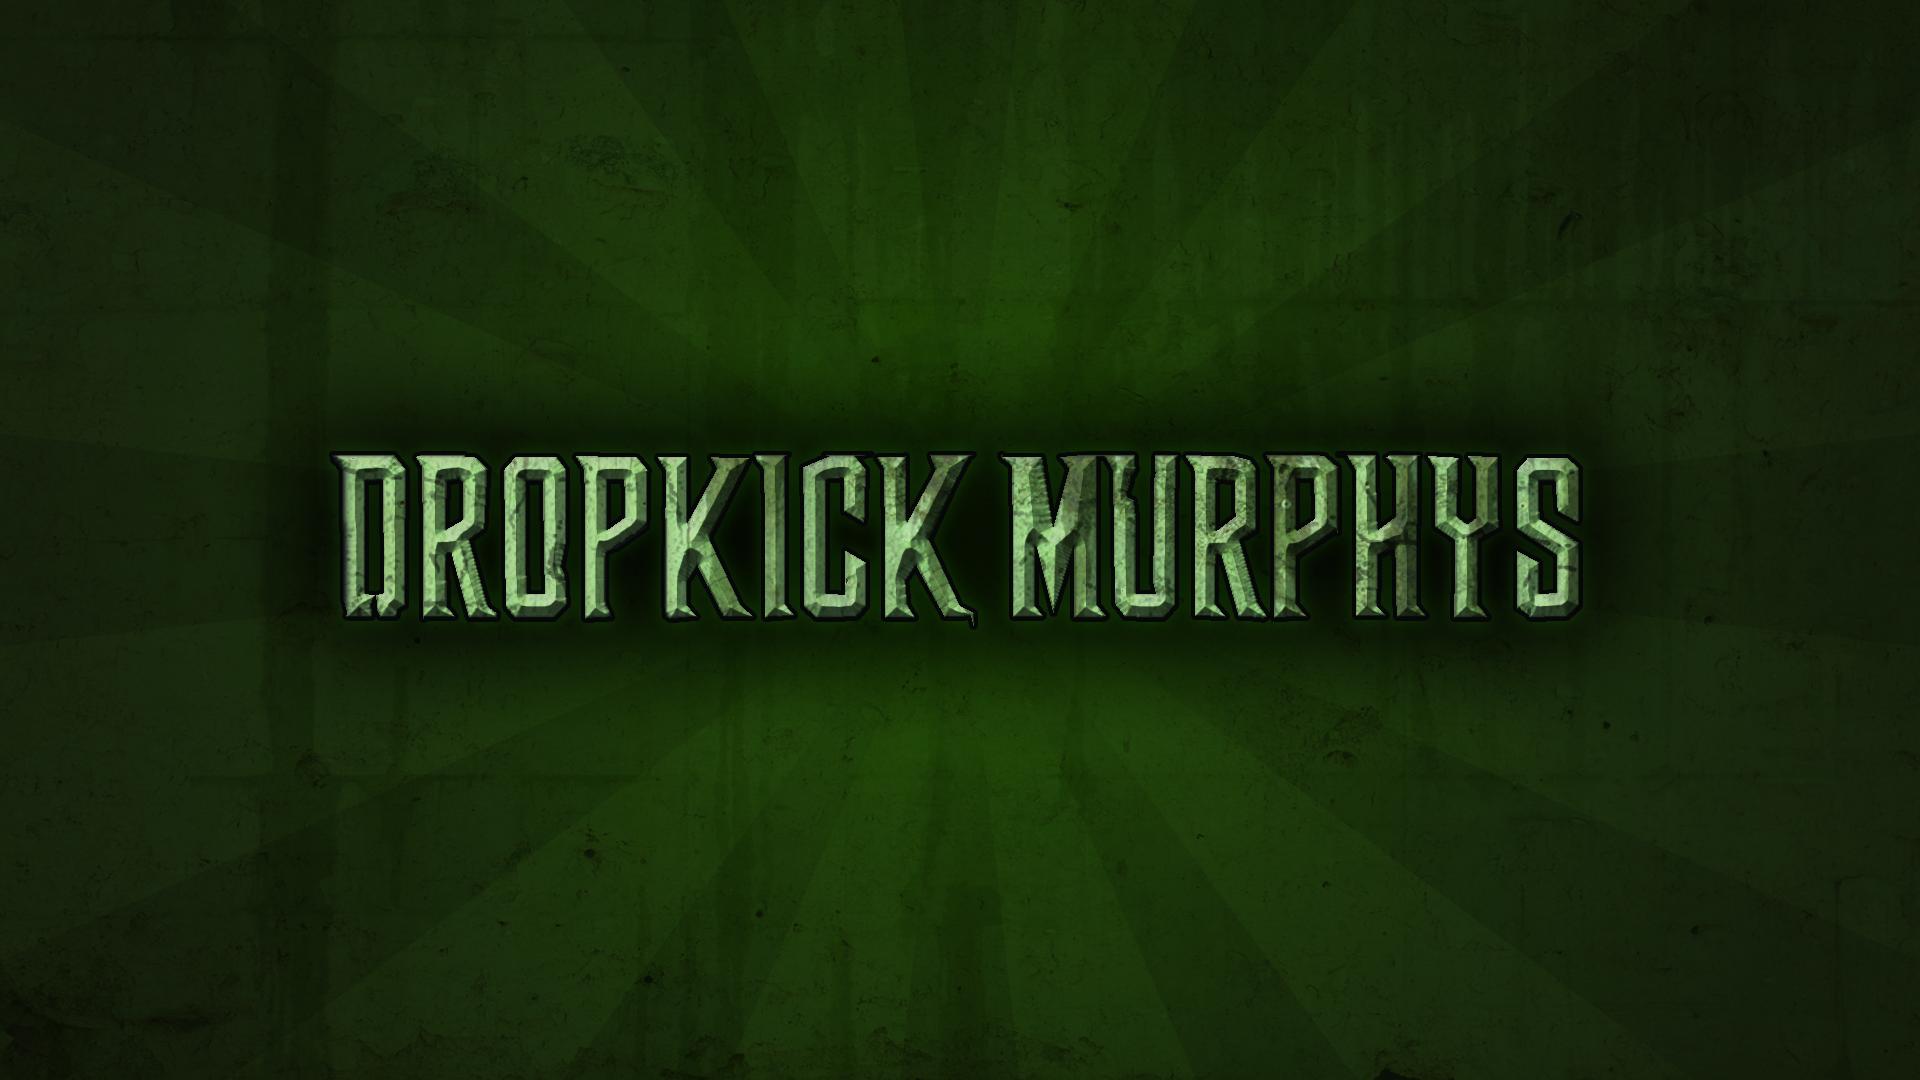 2 dropkick murphys hd wallpapers backgrounds wallpaper